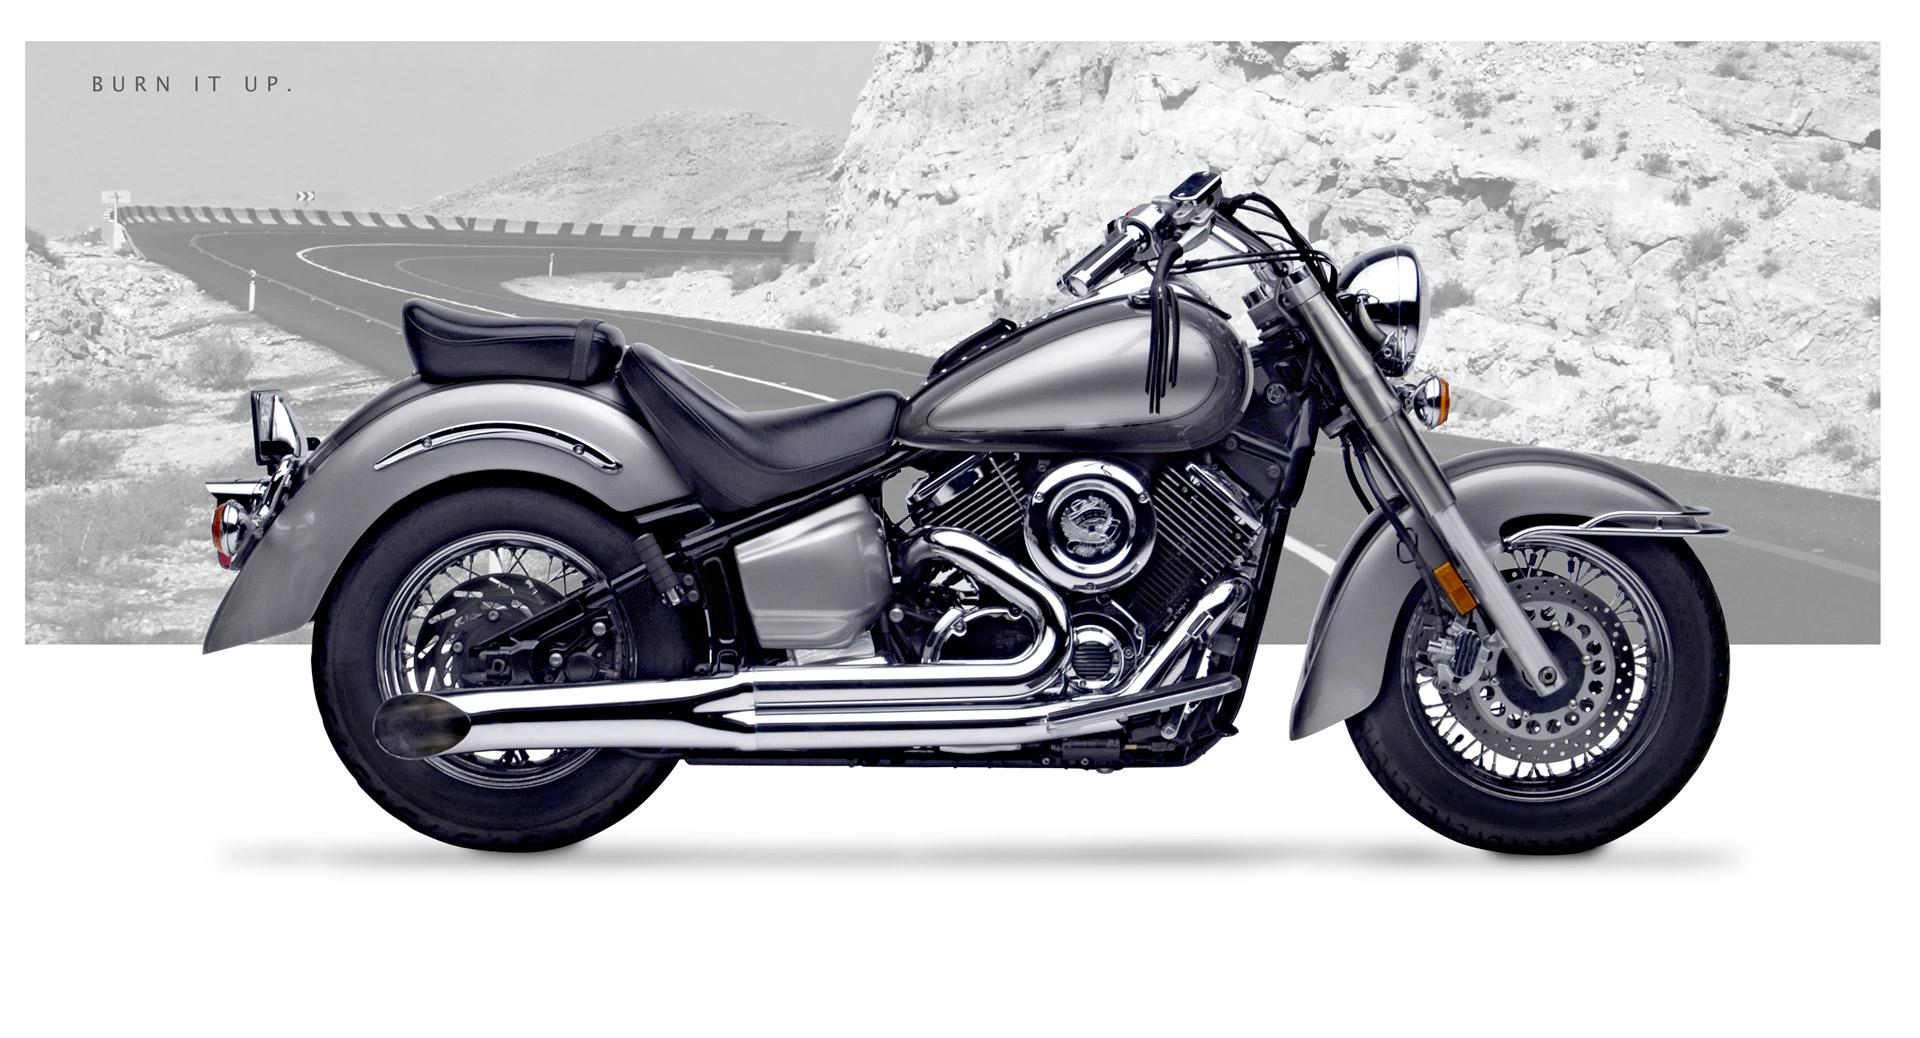 Yamaha V Star 1100 Motorcycle Exhaust - Sideburner Chrome | Hard-Krome